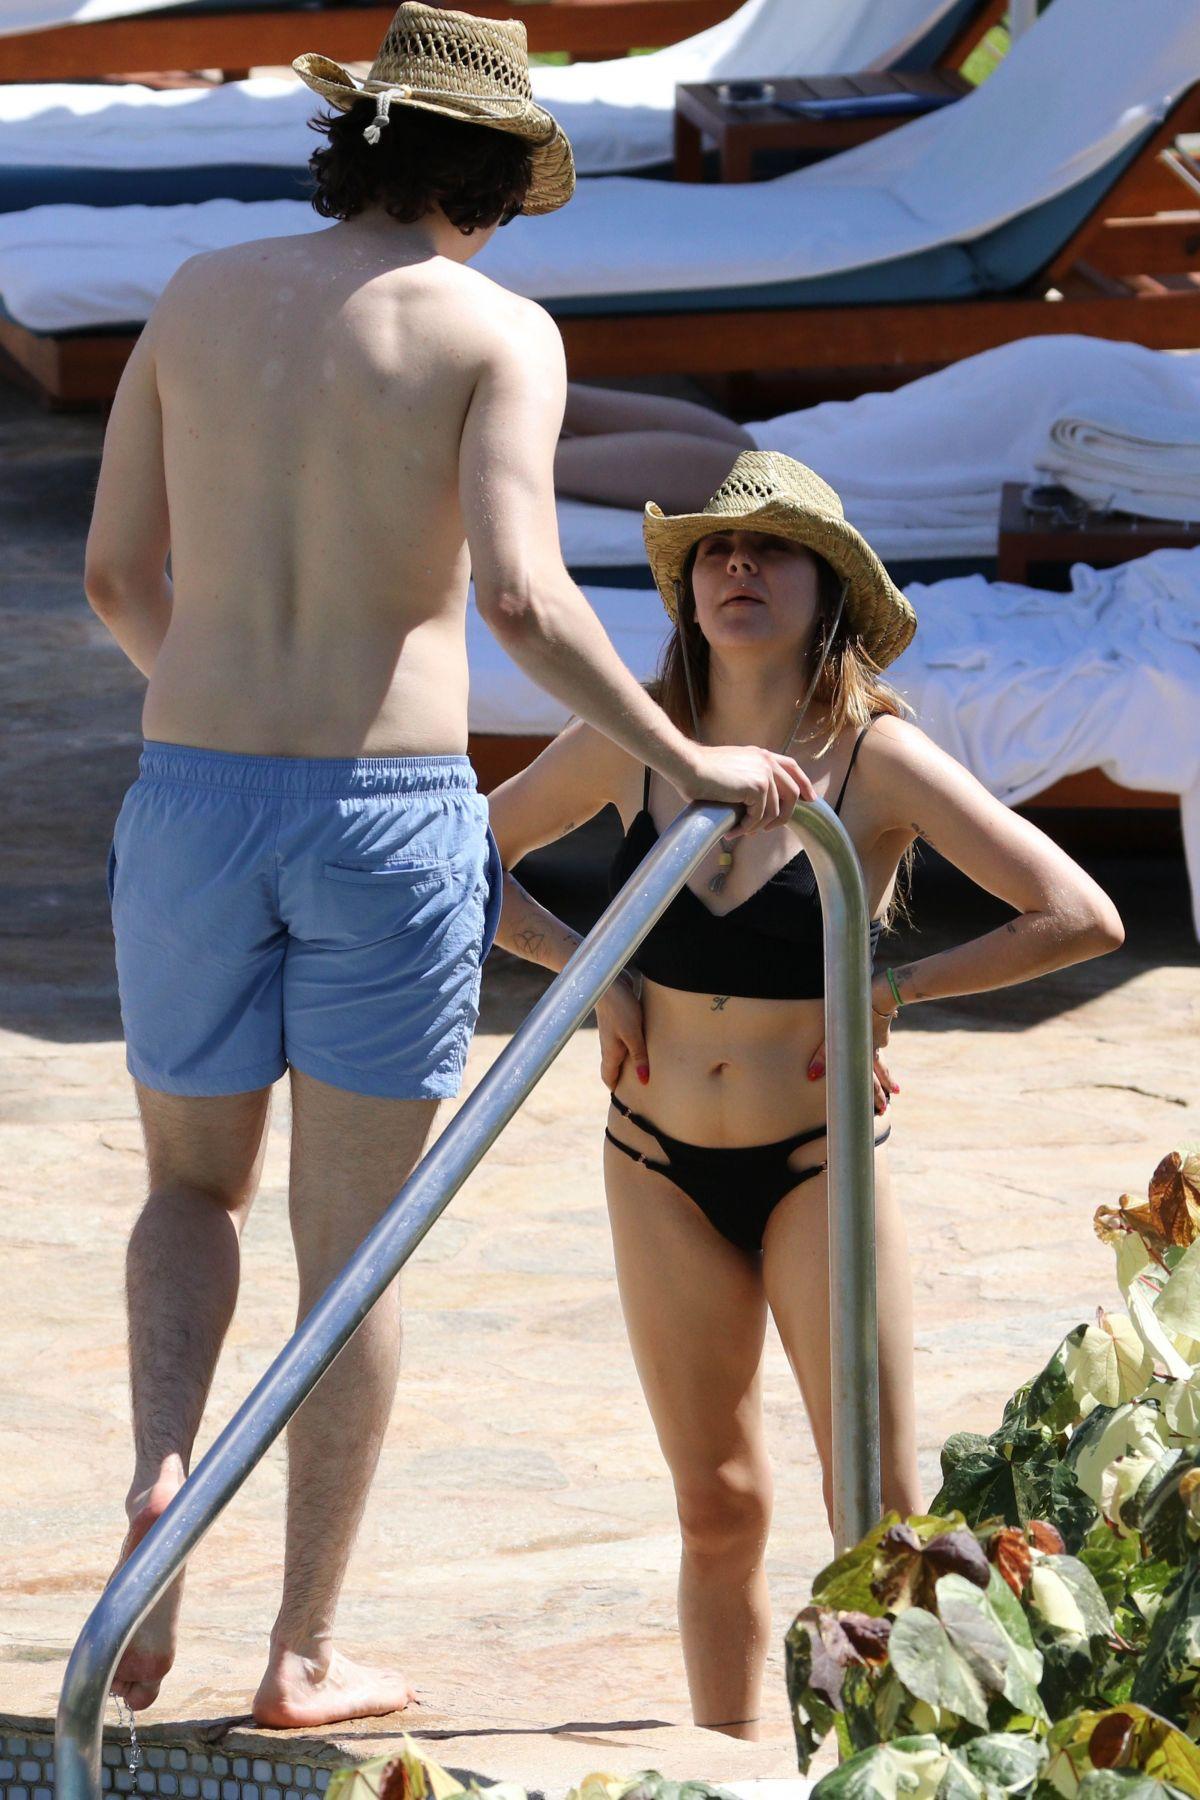 Bikini Frances Bean Cobain nudes (15 photo), Tits, Bikini, Twitter, lingerie 2015